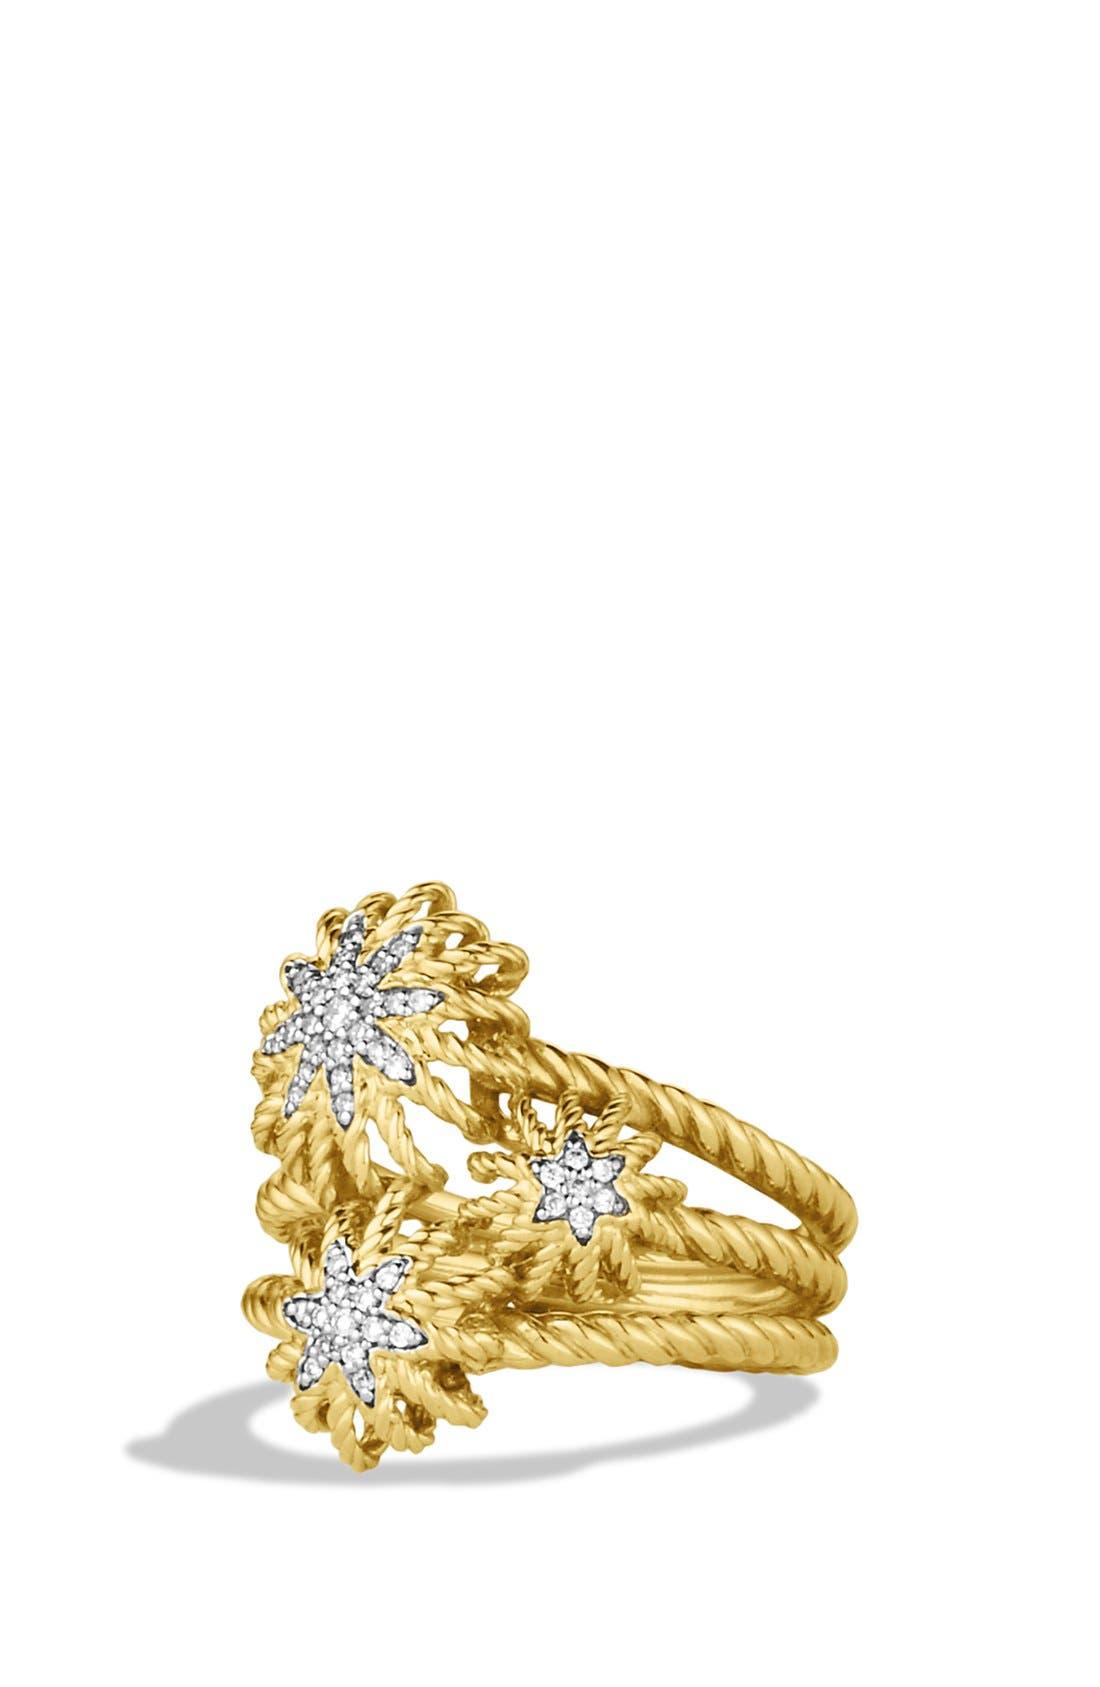 Alternate Image 1 Selected - David Yurman 'Starburst' Cluster Ring with Diamonds in Gold